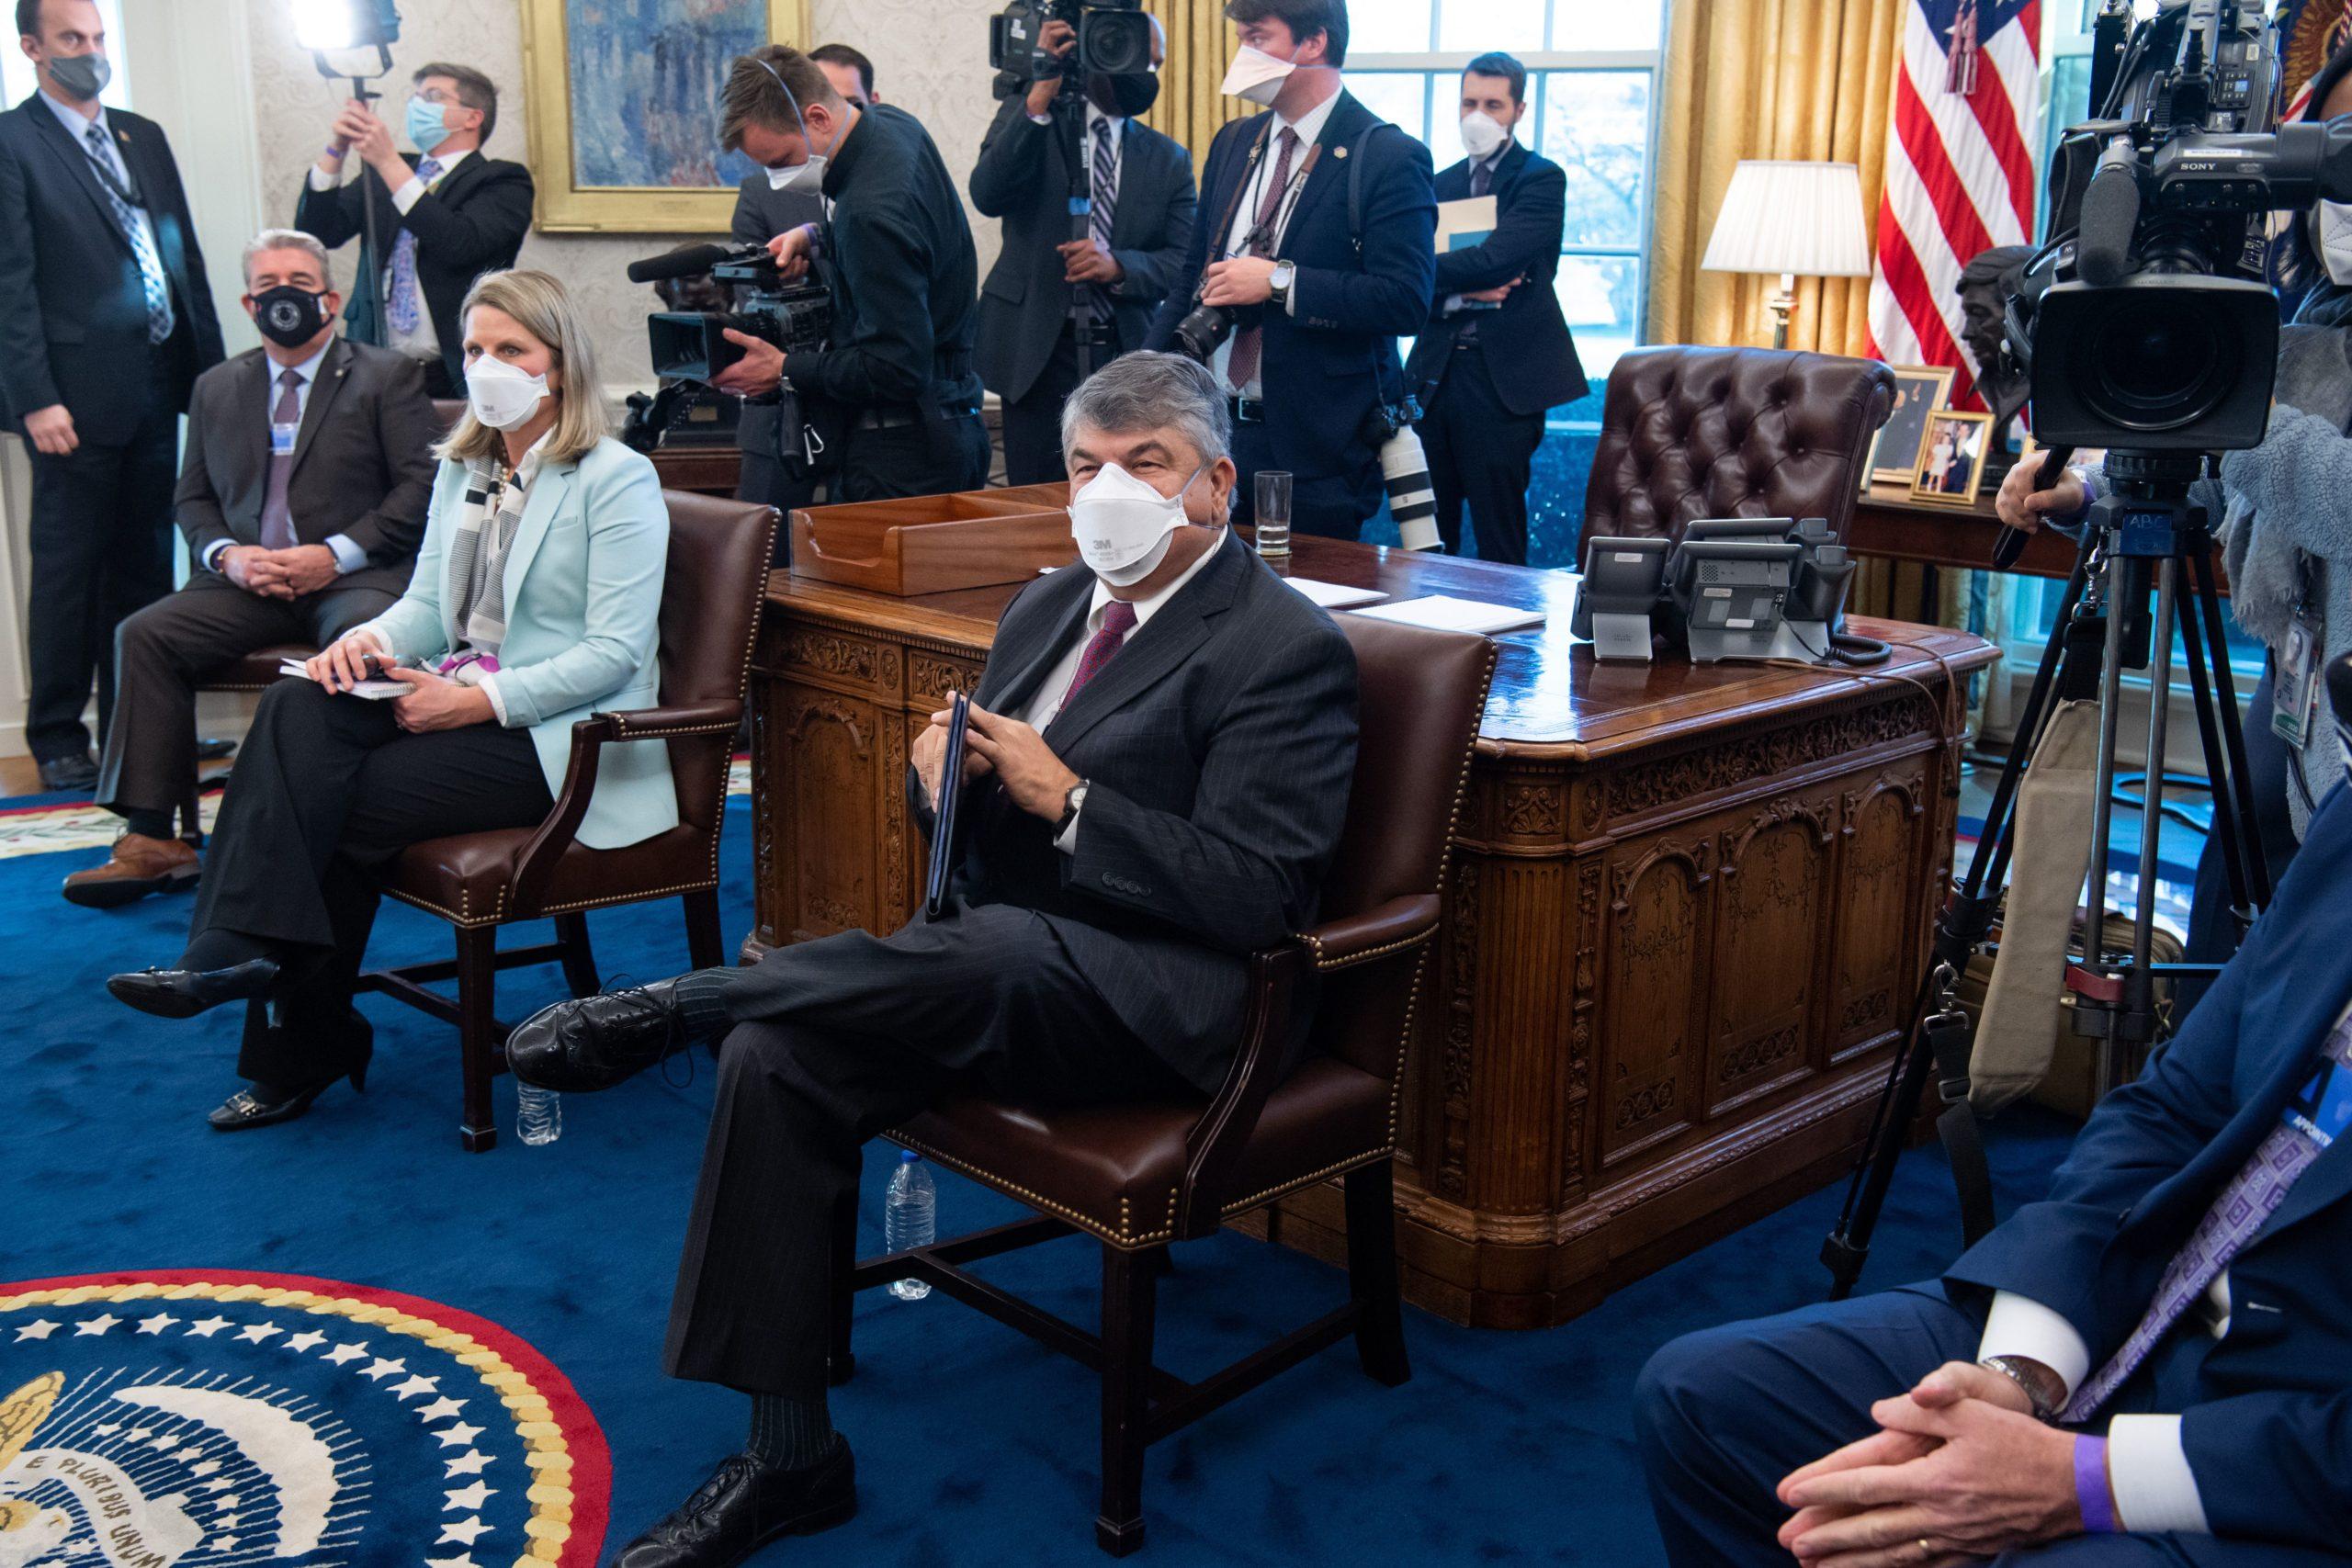 AFL-CIO President Richard Trumka attends a meeting with President Joe Biden on Feb. 17. (Saul Loeb/AFP via Getty Images)